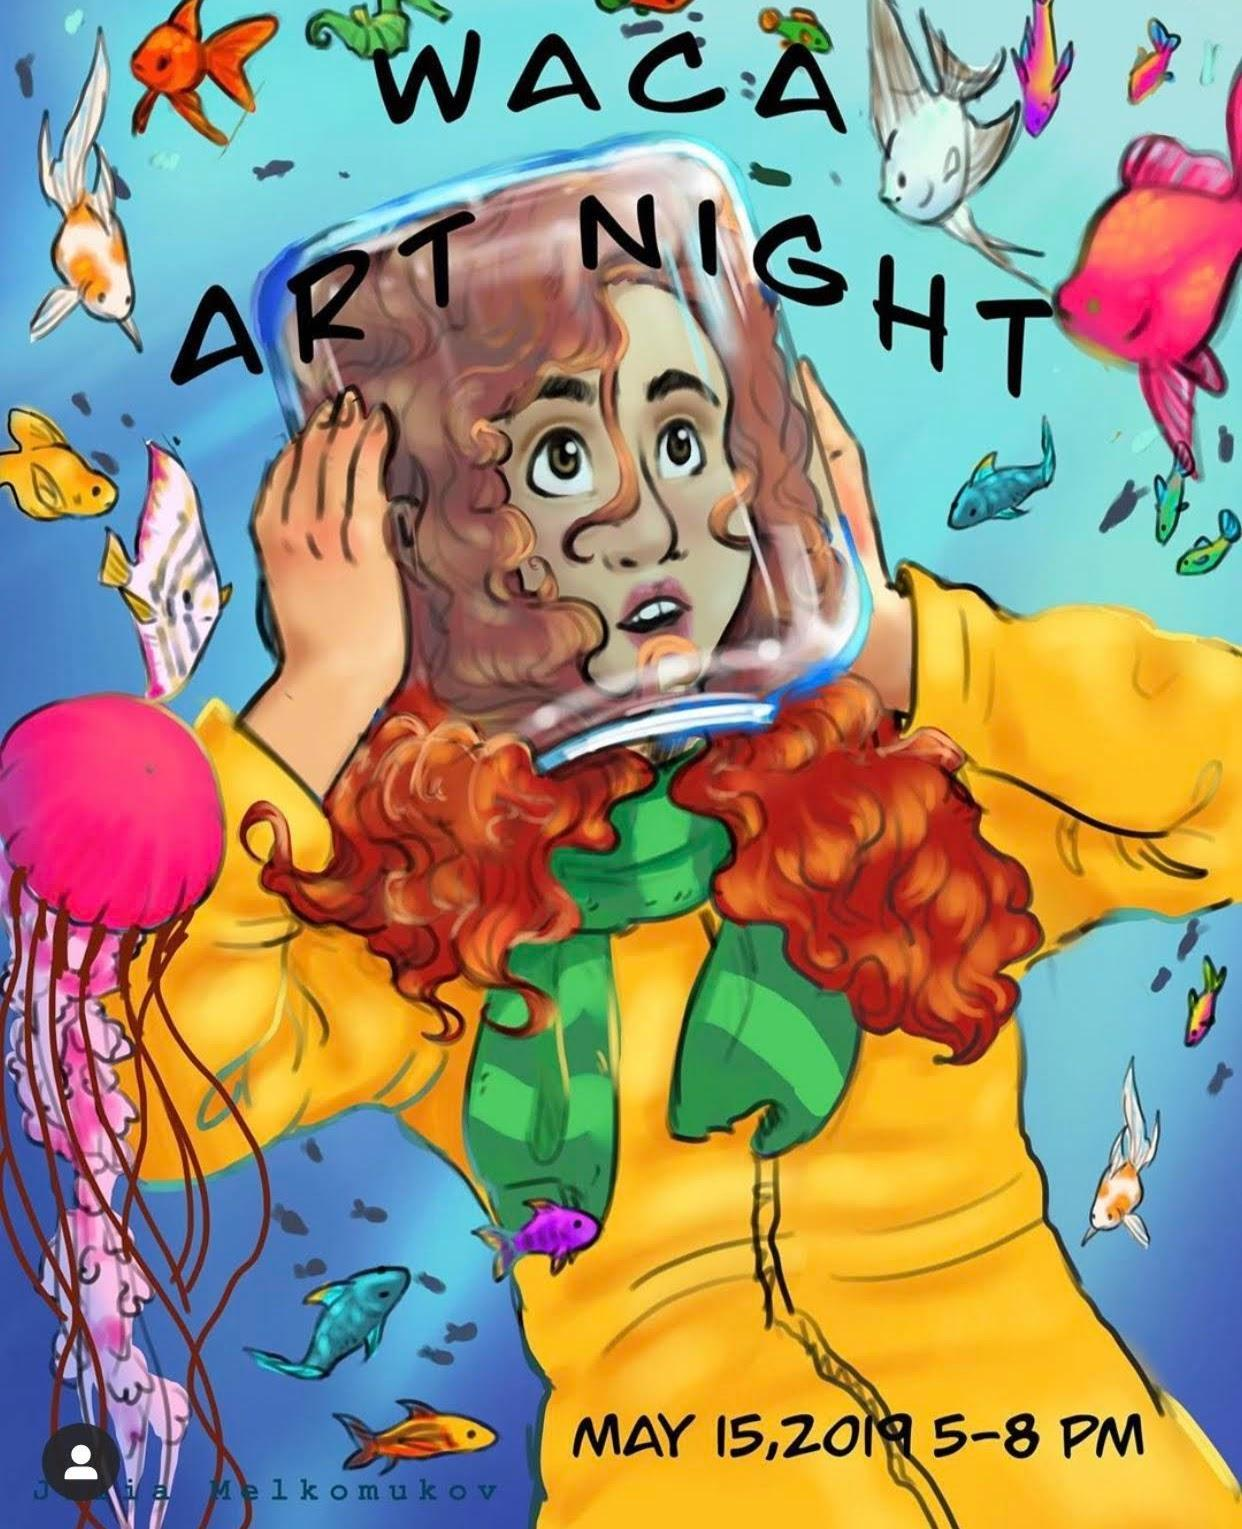 WACA Art Night Poster